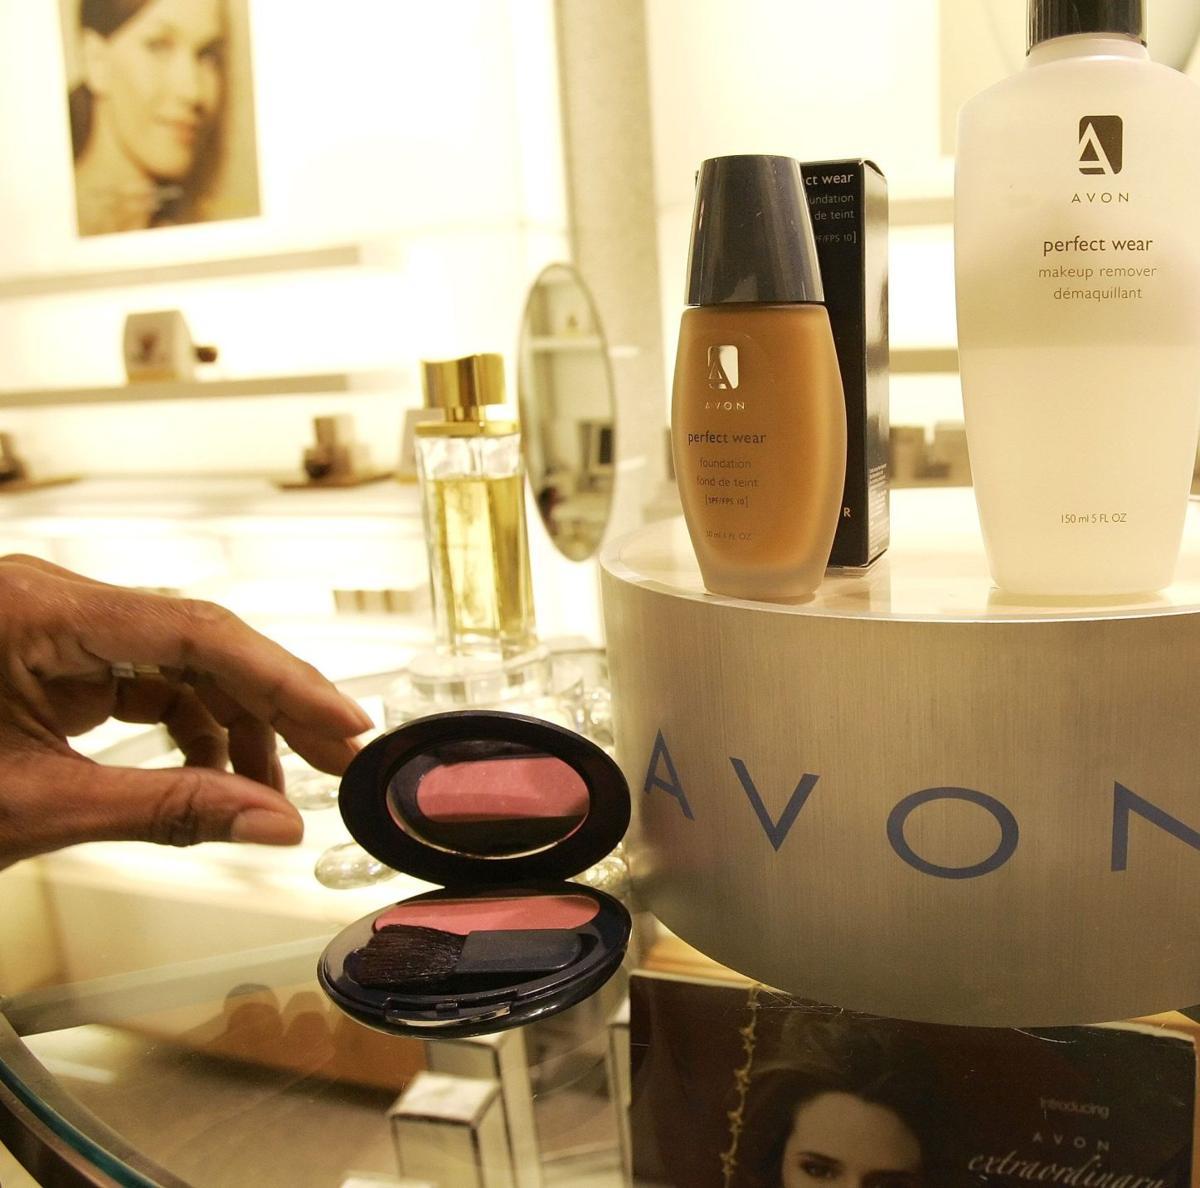 Struggling Avon rejects $10B buyout offer